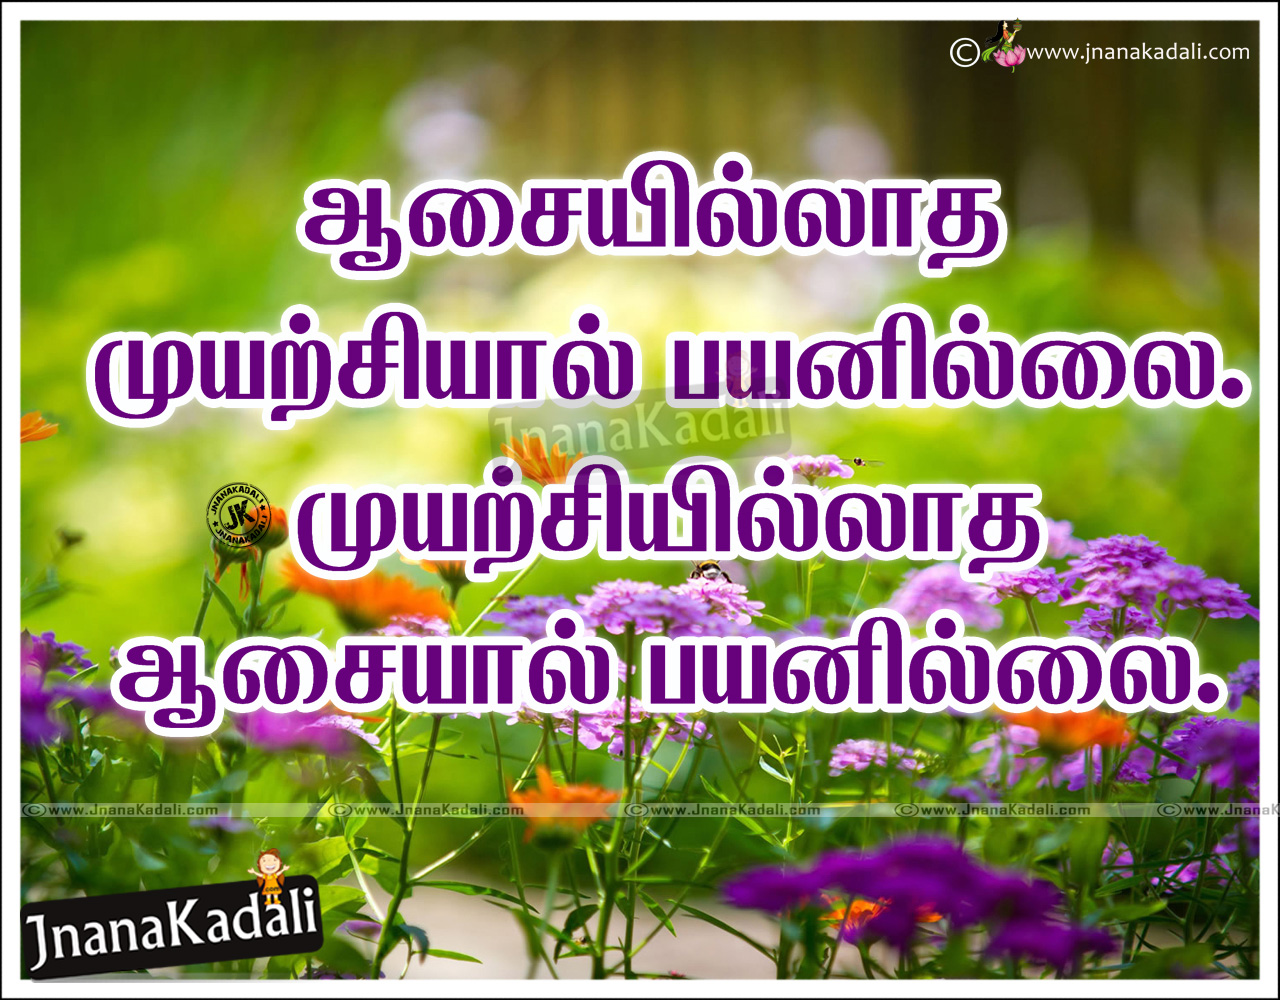 7 habits in tamil pdf free download